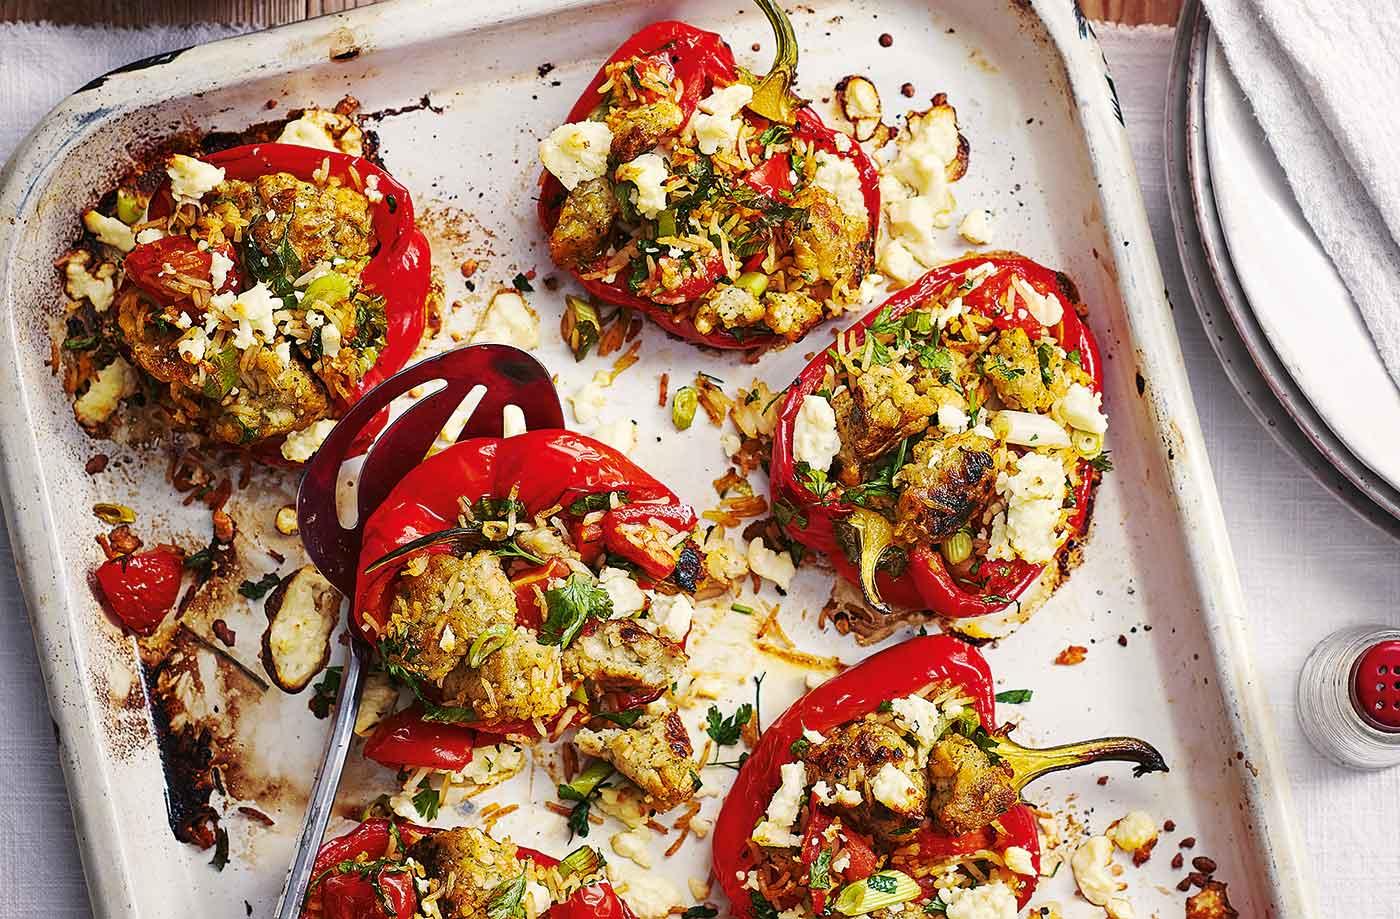 Cheesy Stuffed Peppers